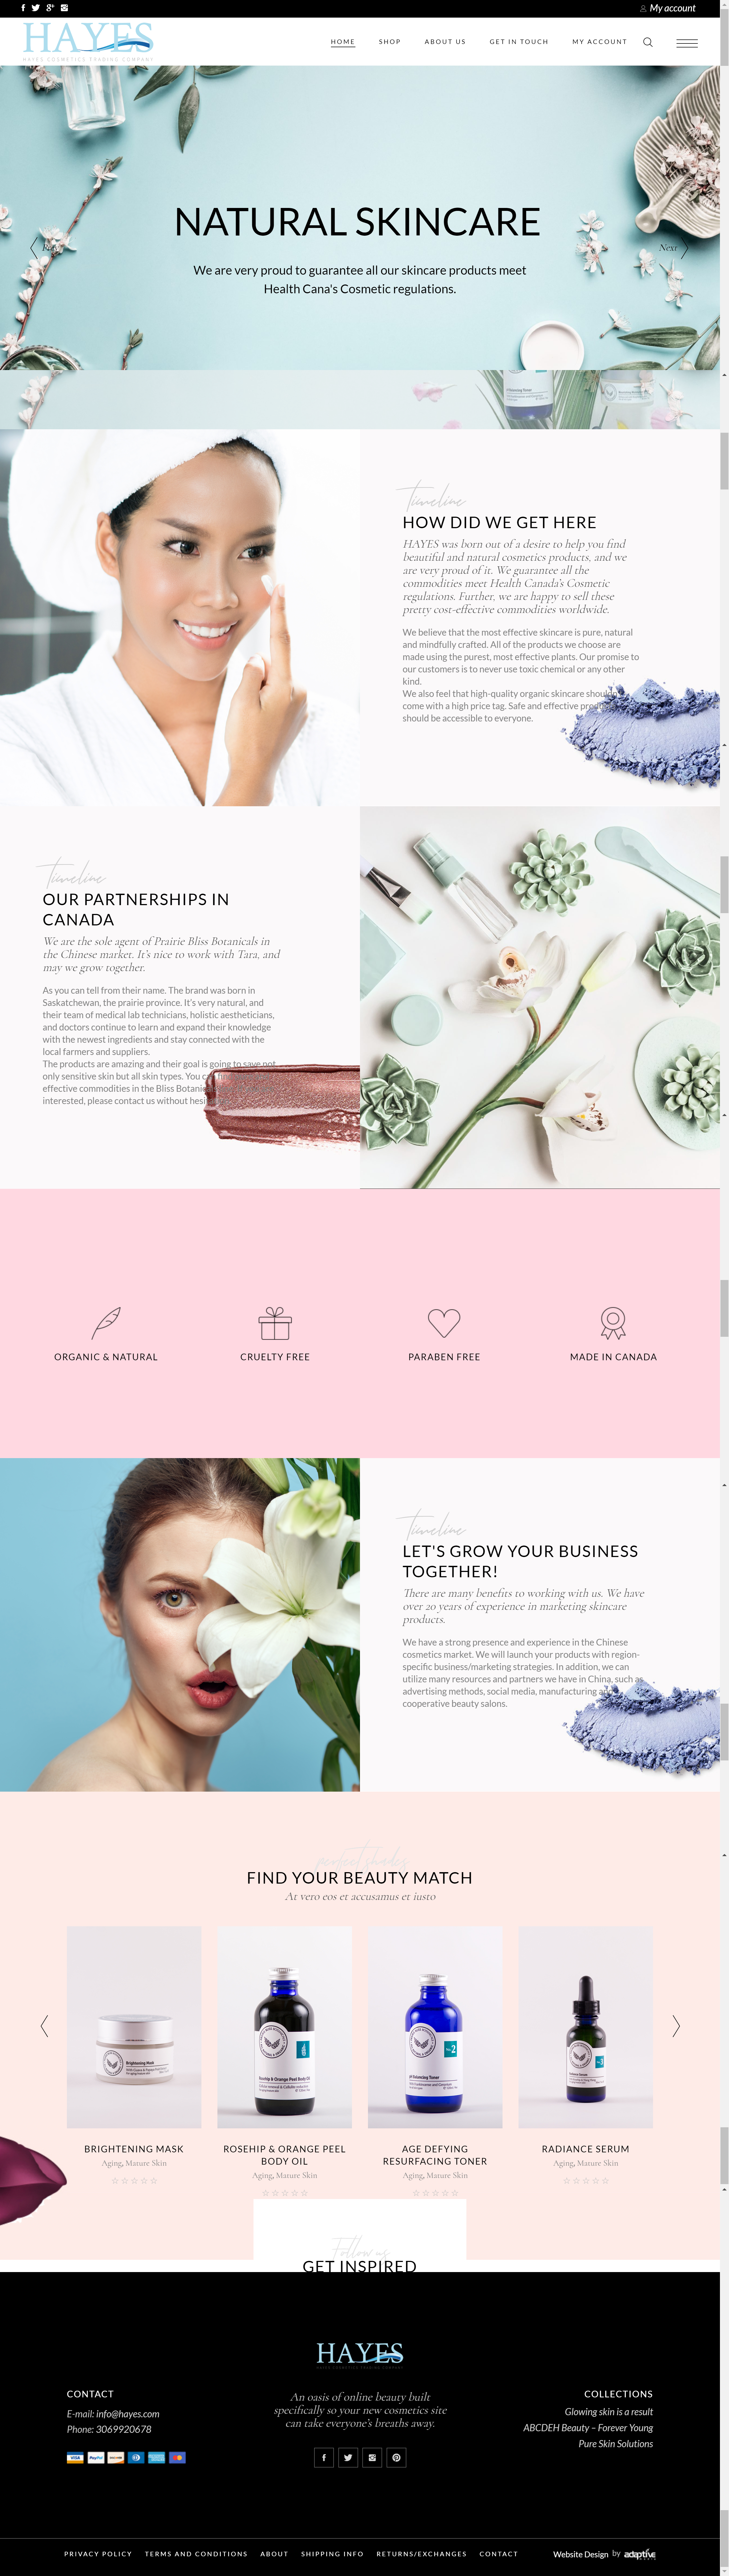 cosmetics company website design regina